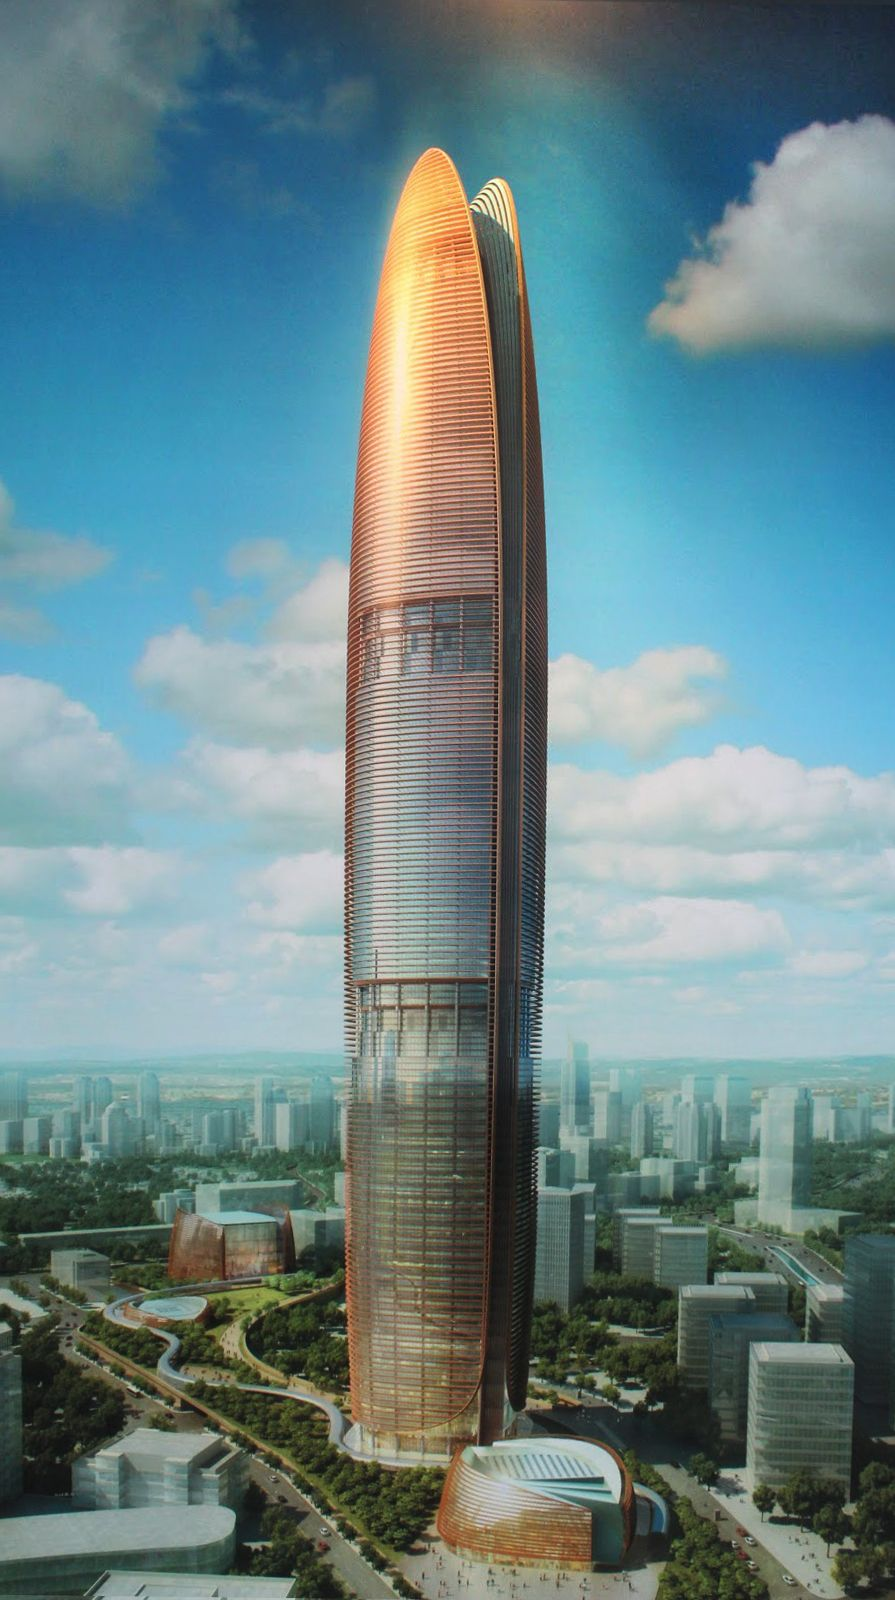 The Pertamina Tower at Rasuna Epicentrum area, South Jakarta / Office / 550m / Under Construction